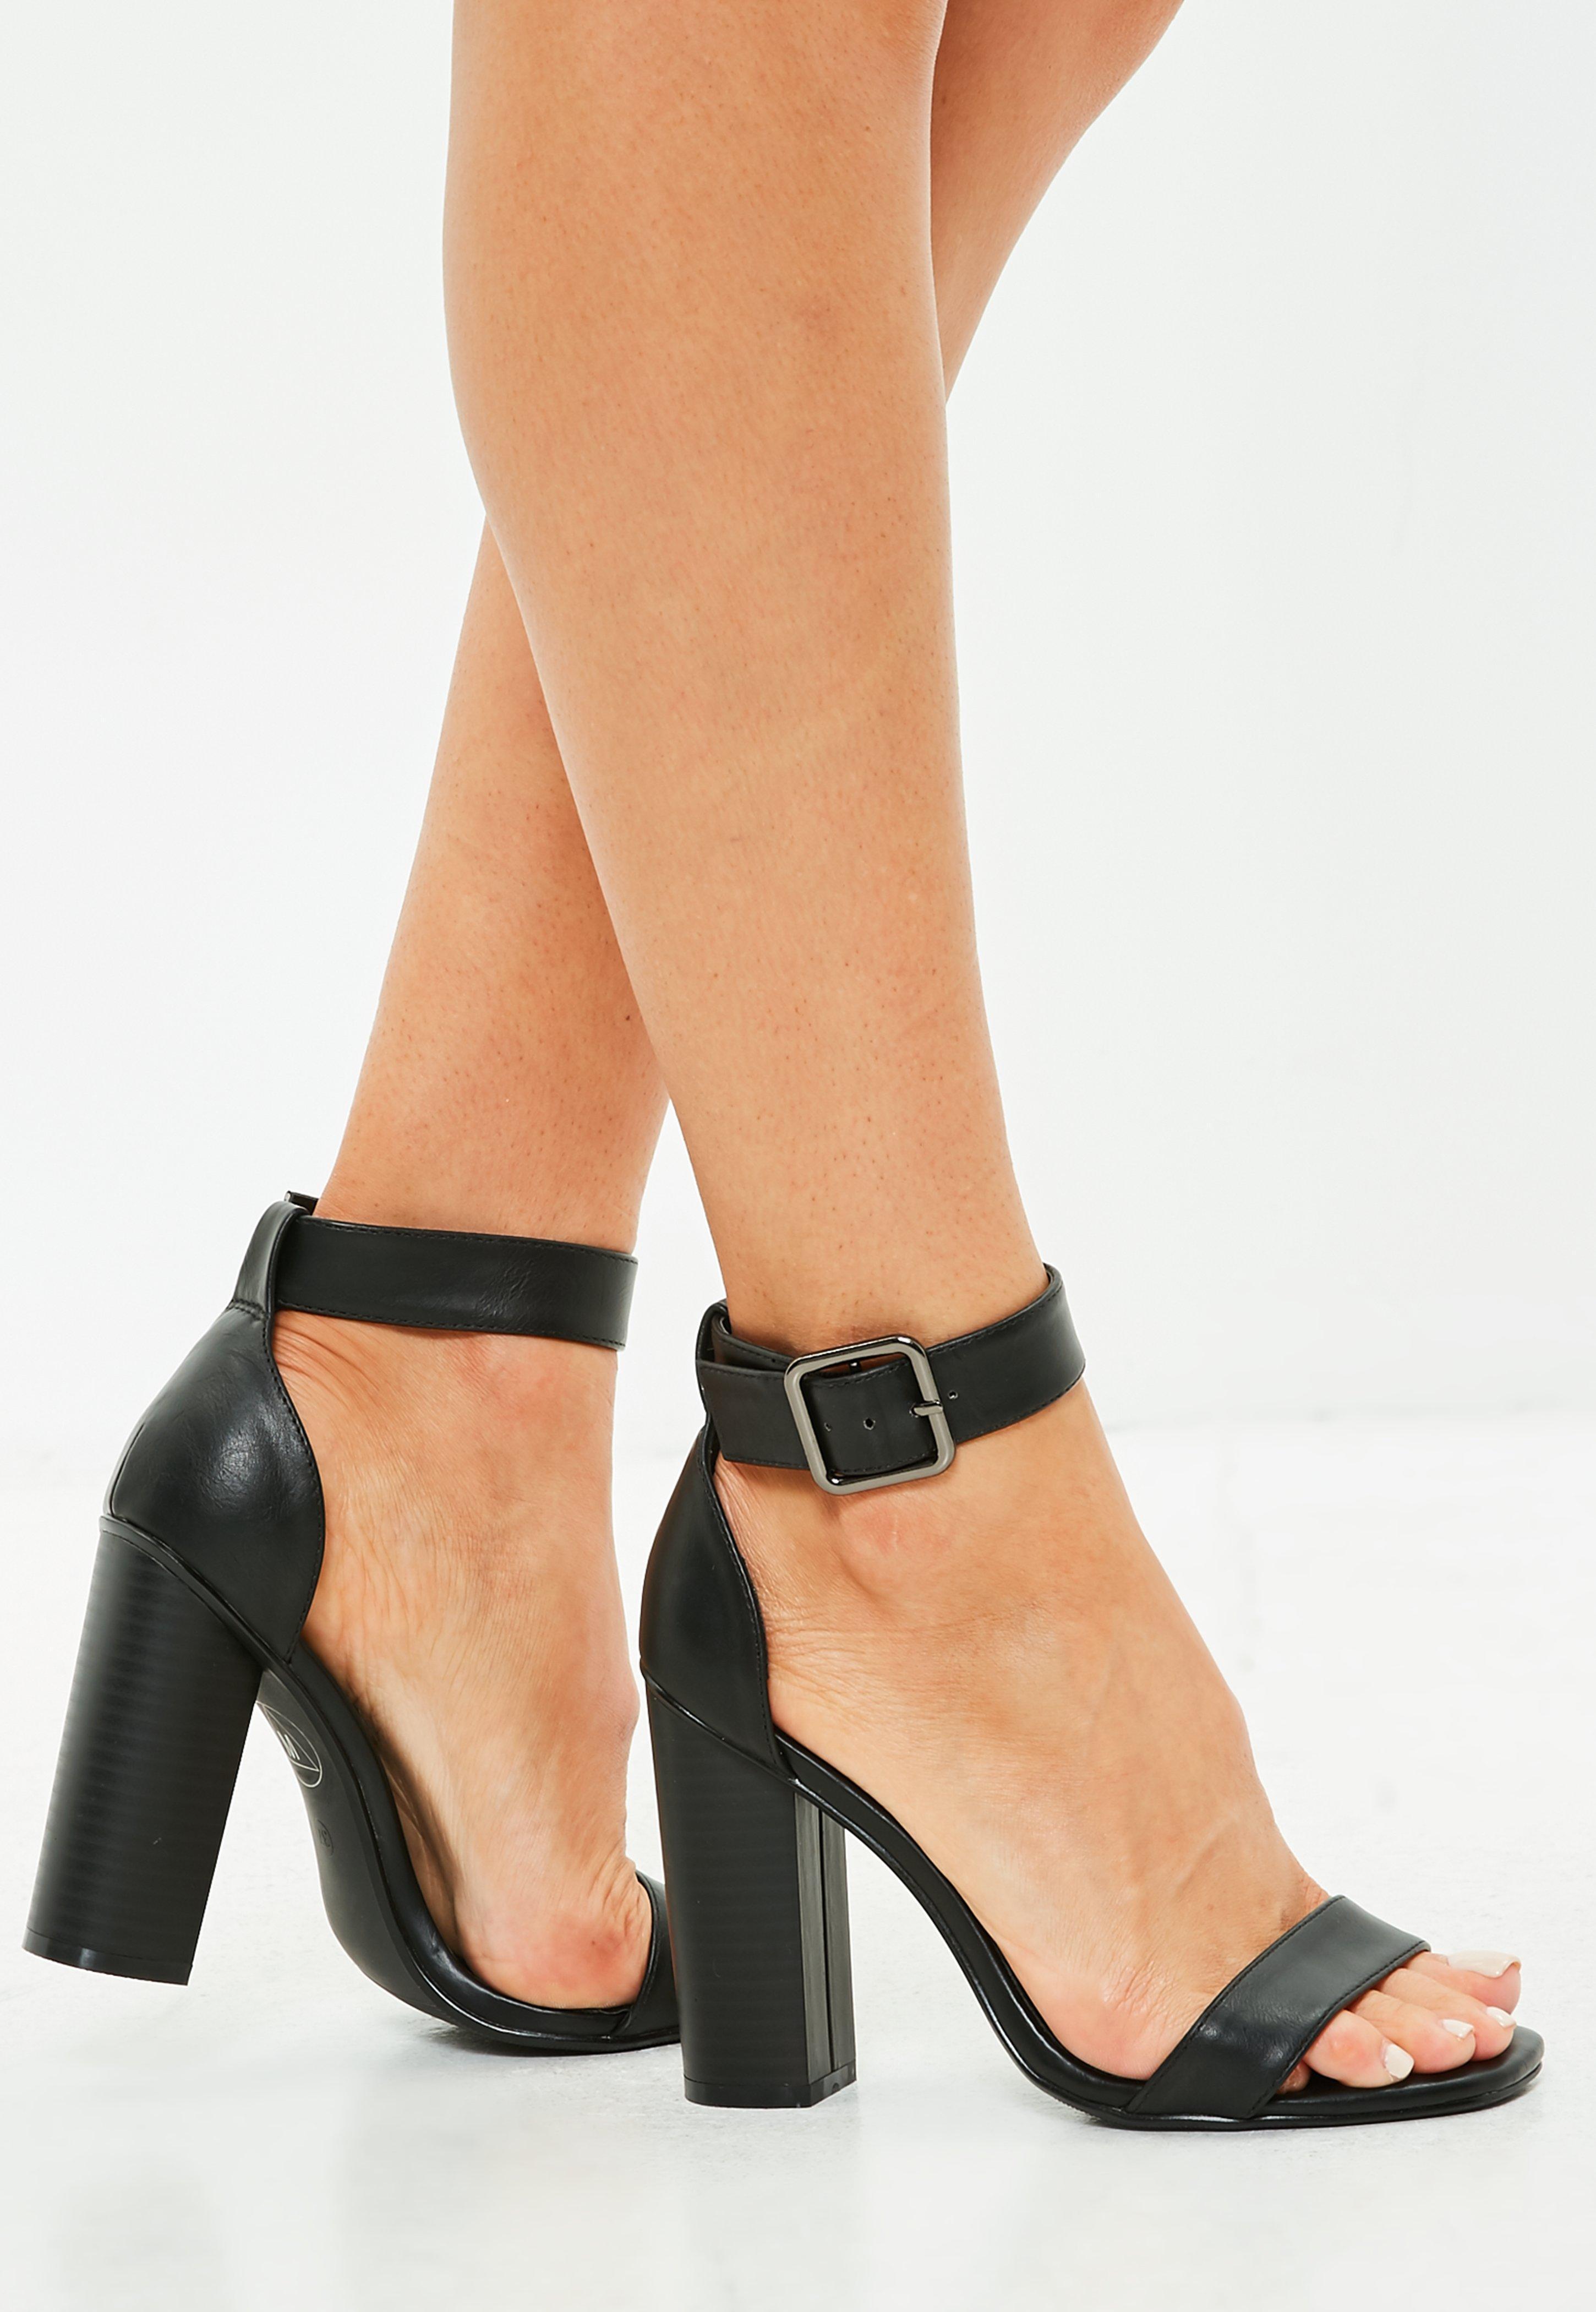 97a3988ea3b Lyst - Missguided Black Big Buckle Block Heeled Sandals in Black